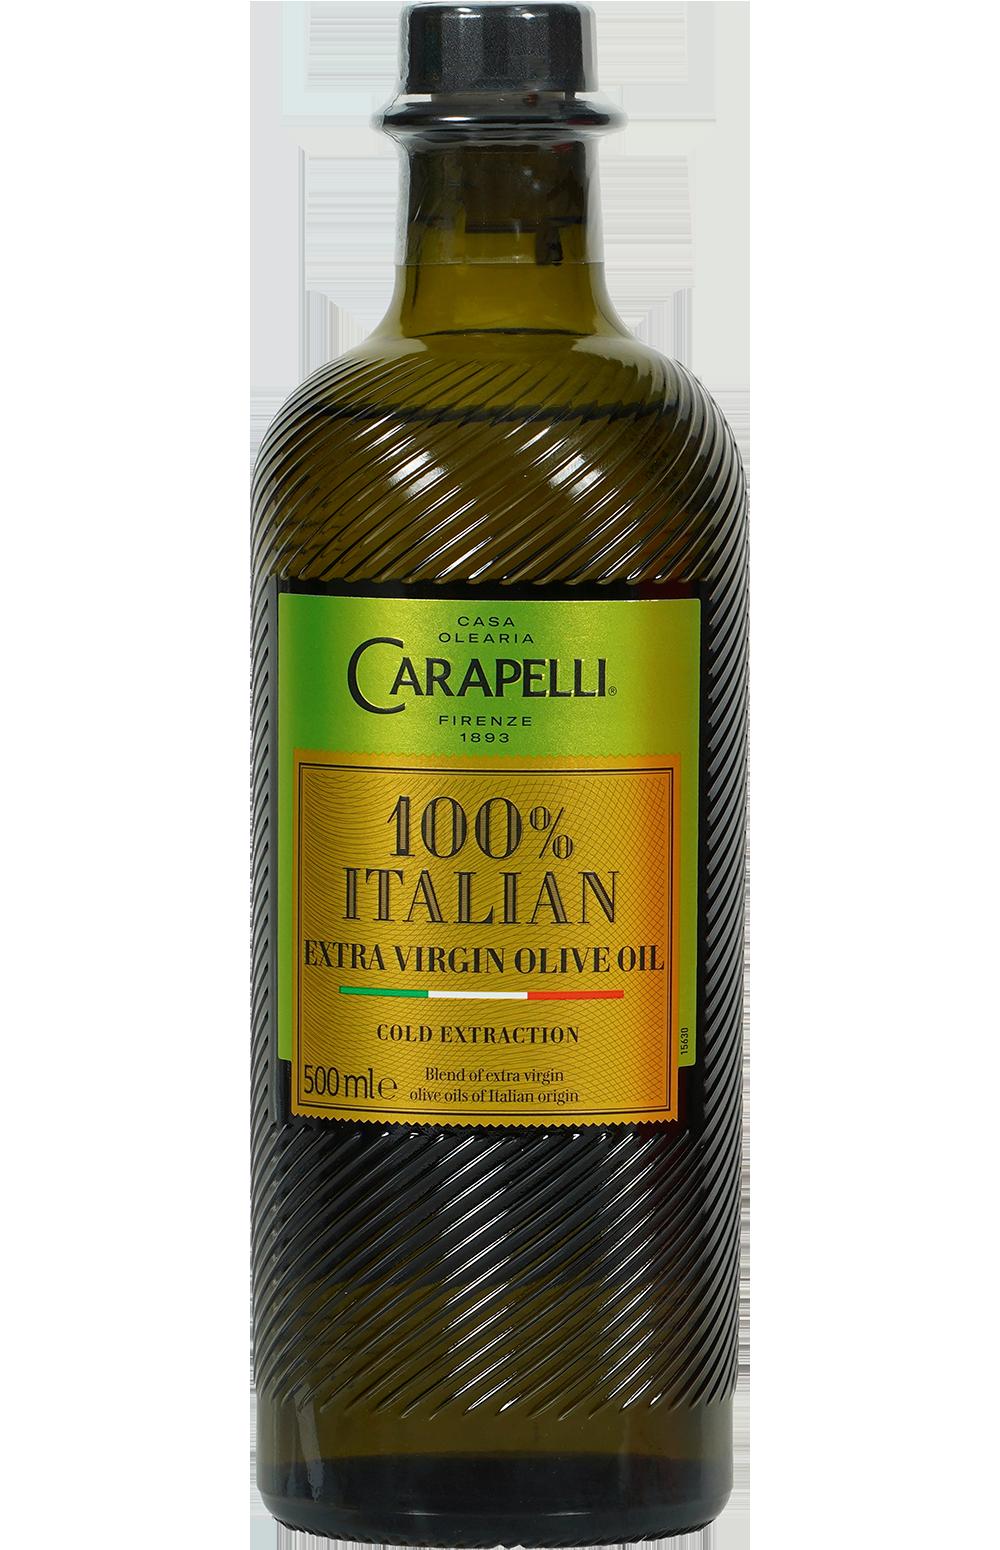 Carapelli Name SKU: 100% Italian